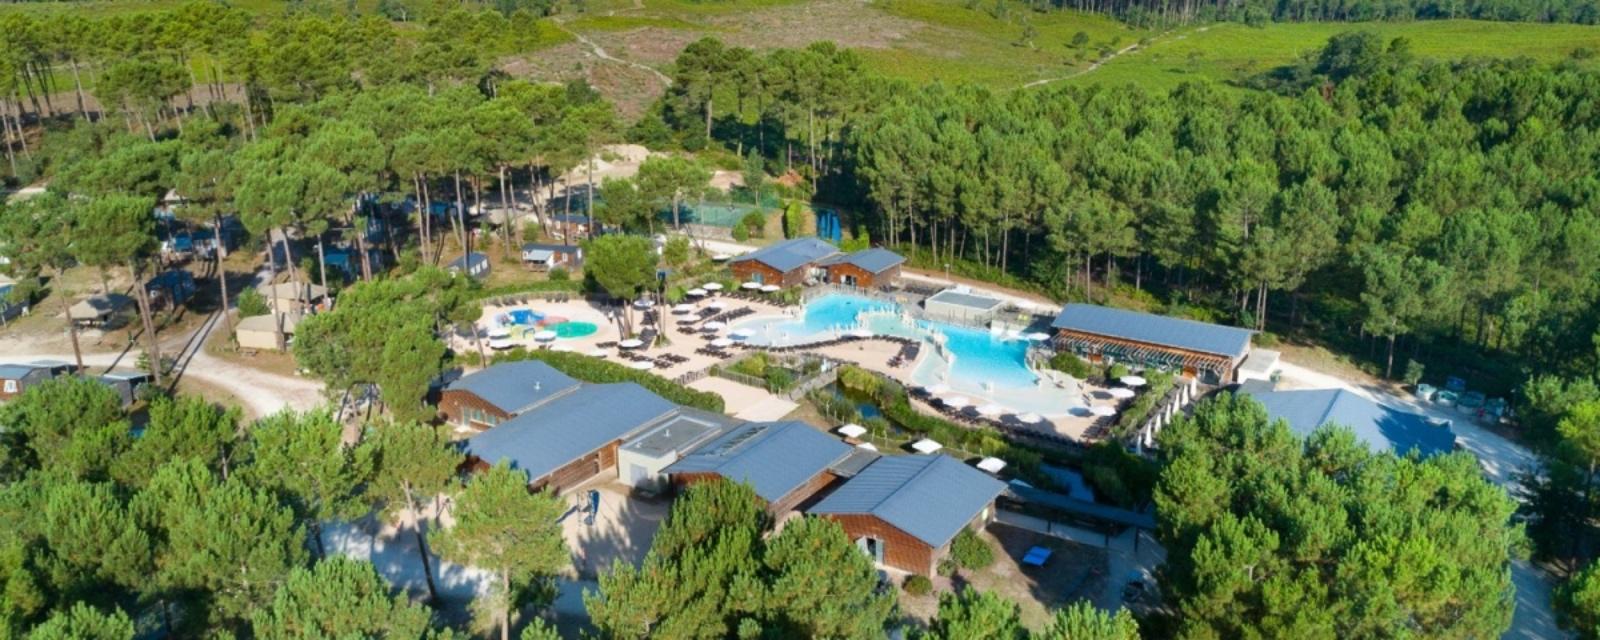 Supertrips - Camping Souston Village